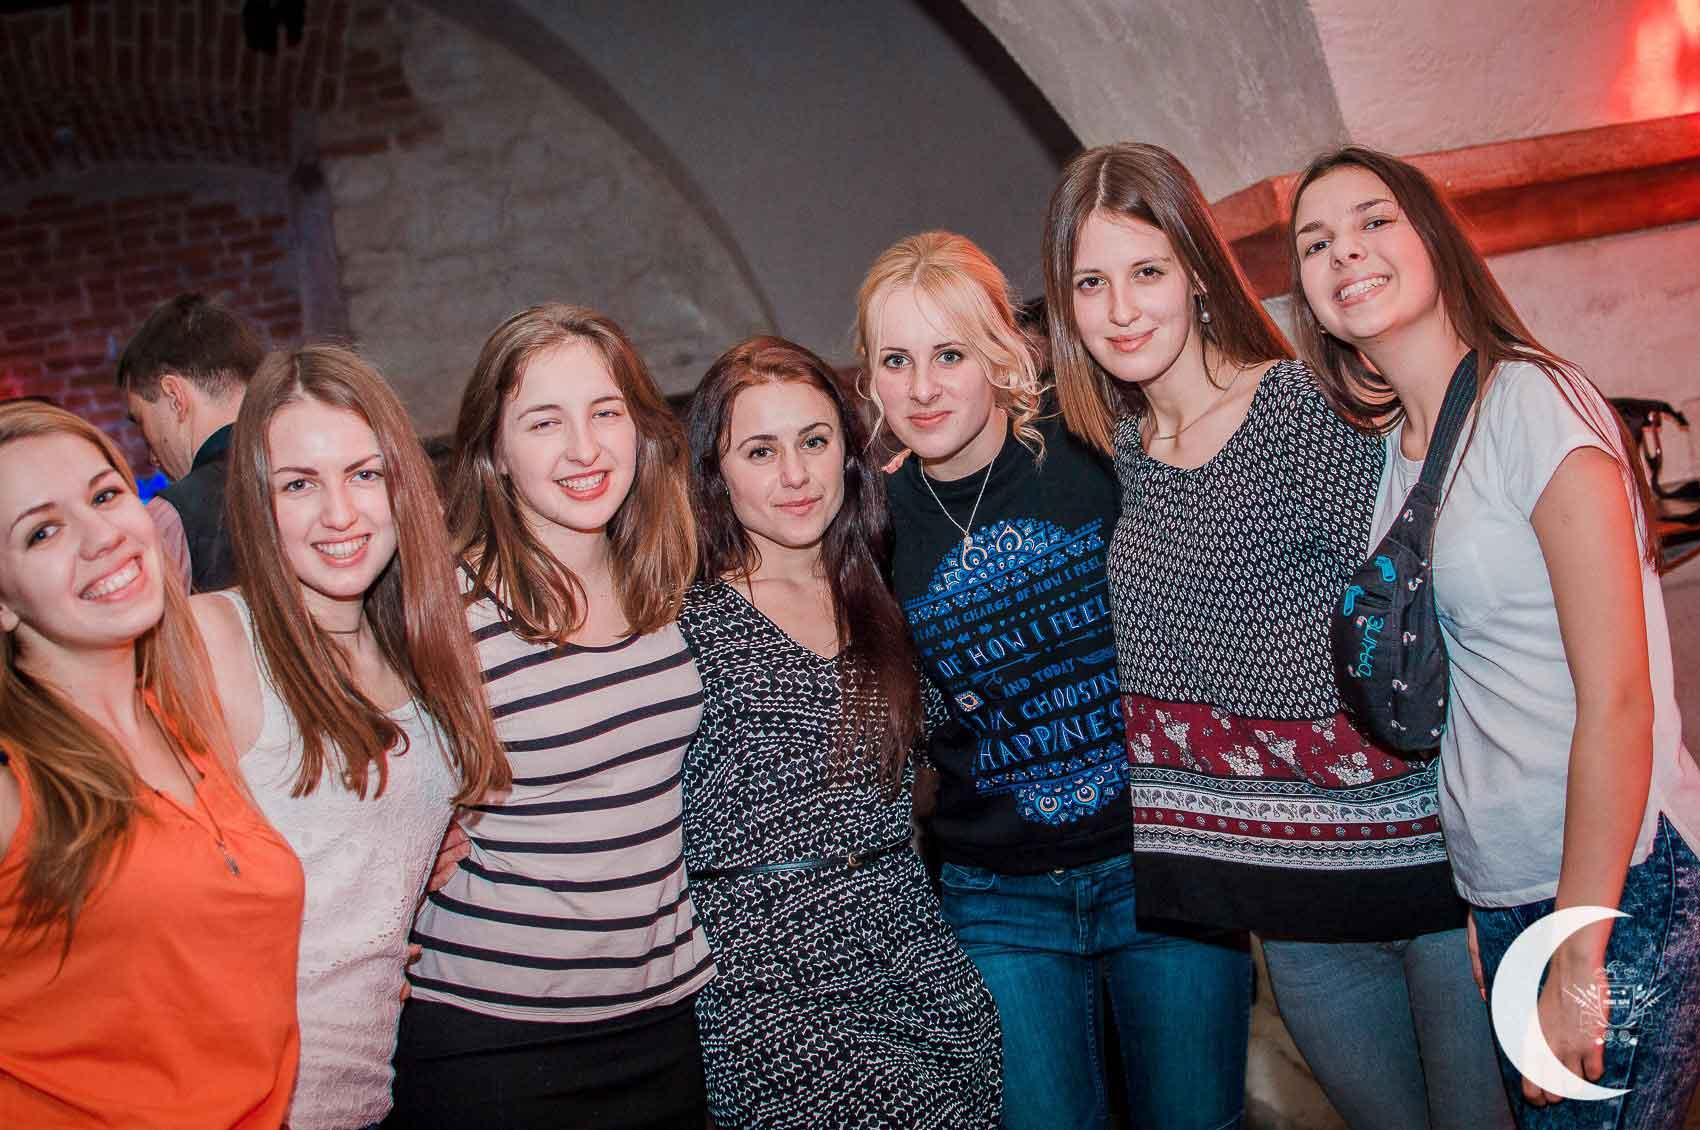 Arsenal Club Dans, Lviv Arsenal, Lviv Dans Kulüpleri, Ukrayna Lviv Salsa Kulüpleri, Lviv de Nerde Dans Edilir, Lviv Dans Kulübü, Lviv Dans ve Eğlence